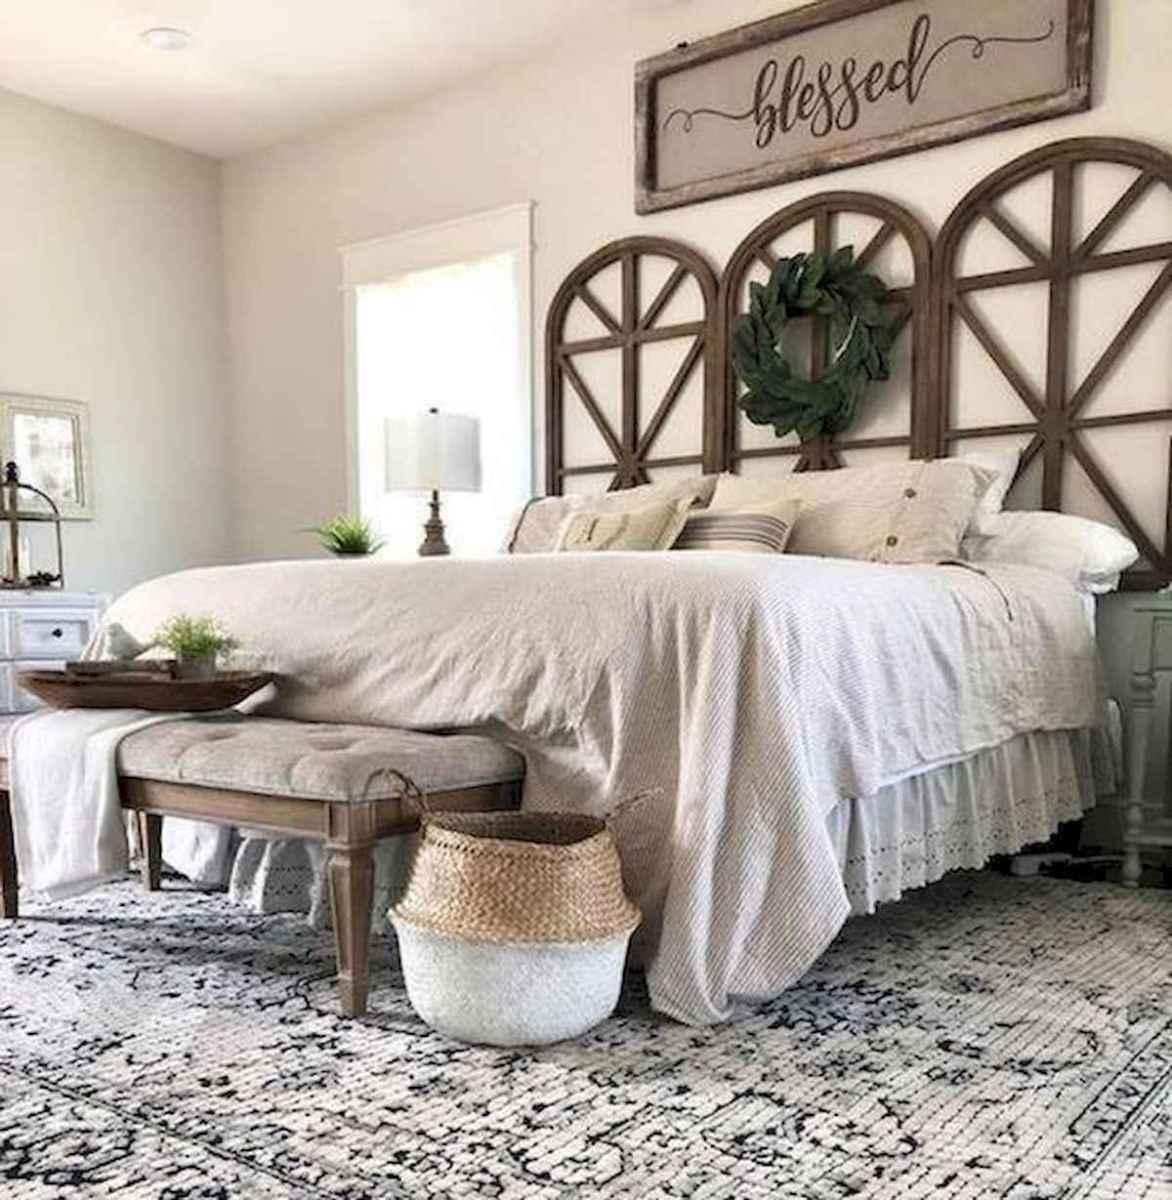 50 Favorite Bedding for Farmhouse Bedroom Design Ideas and Decor (42)